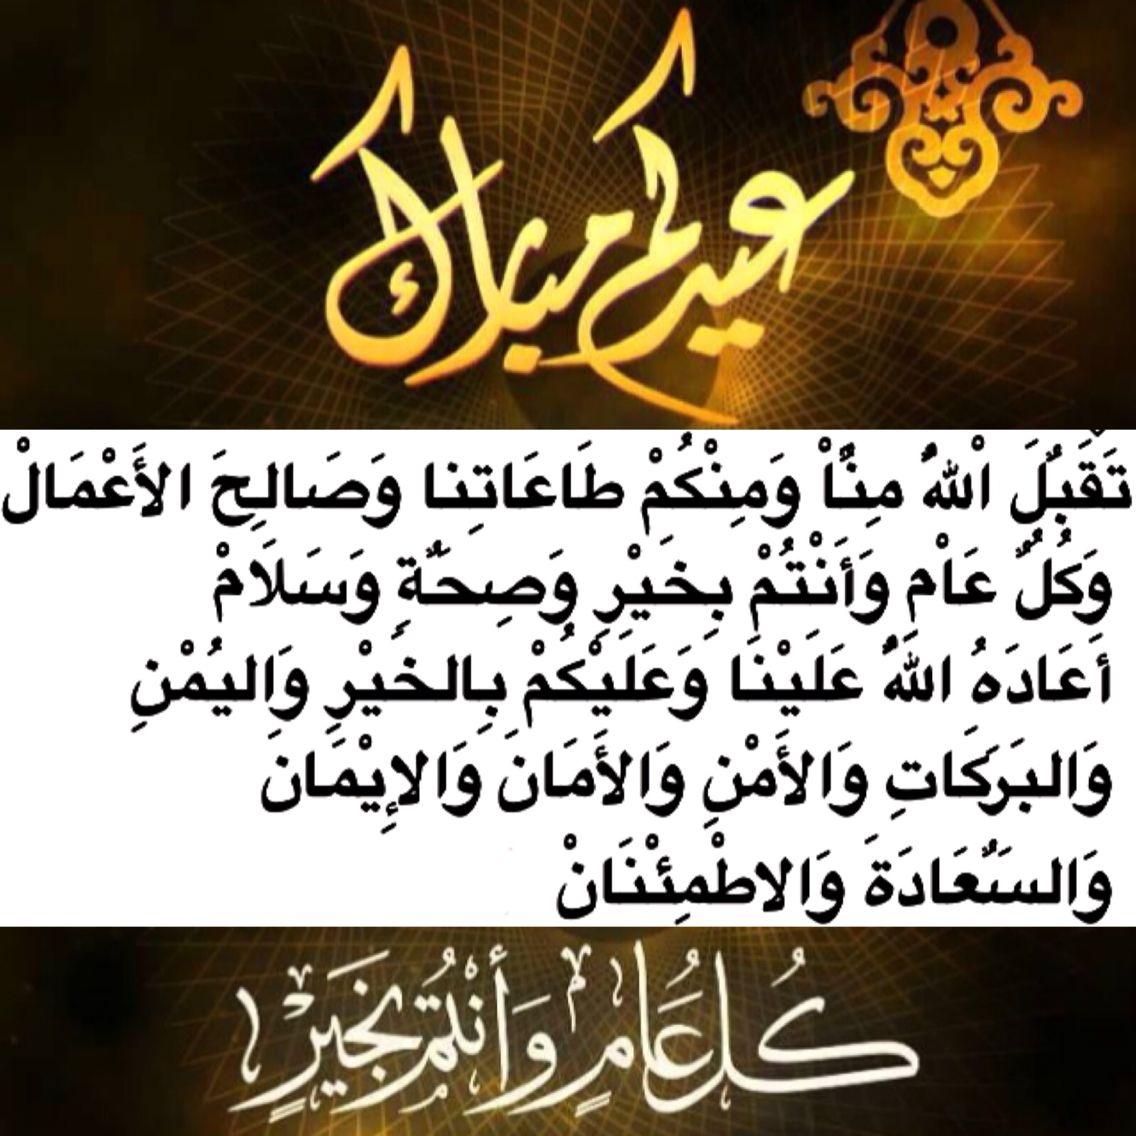 عيدكم مبارك وكل عام وانت بخير Arabic Calligraphy Calligraphy Arabic